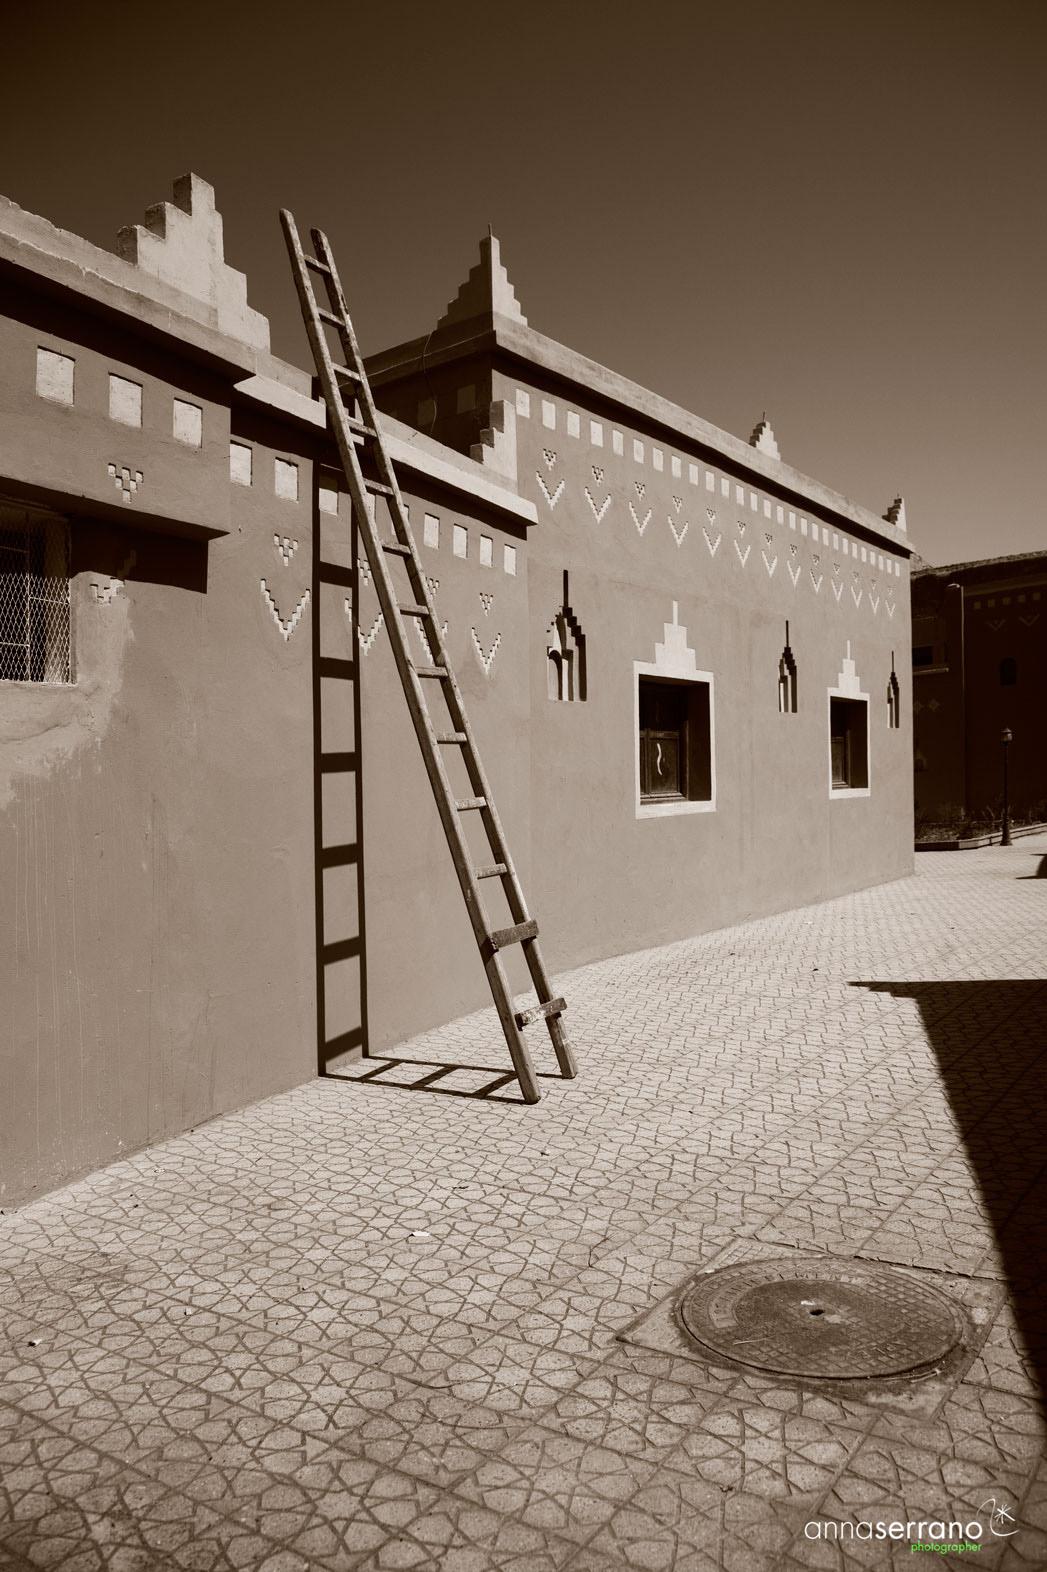 Africa, Magreb, Morocco, Southern Morocco, Zagora, Medersa, Coranic School